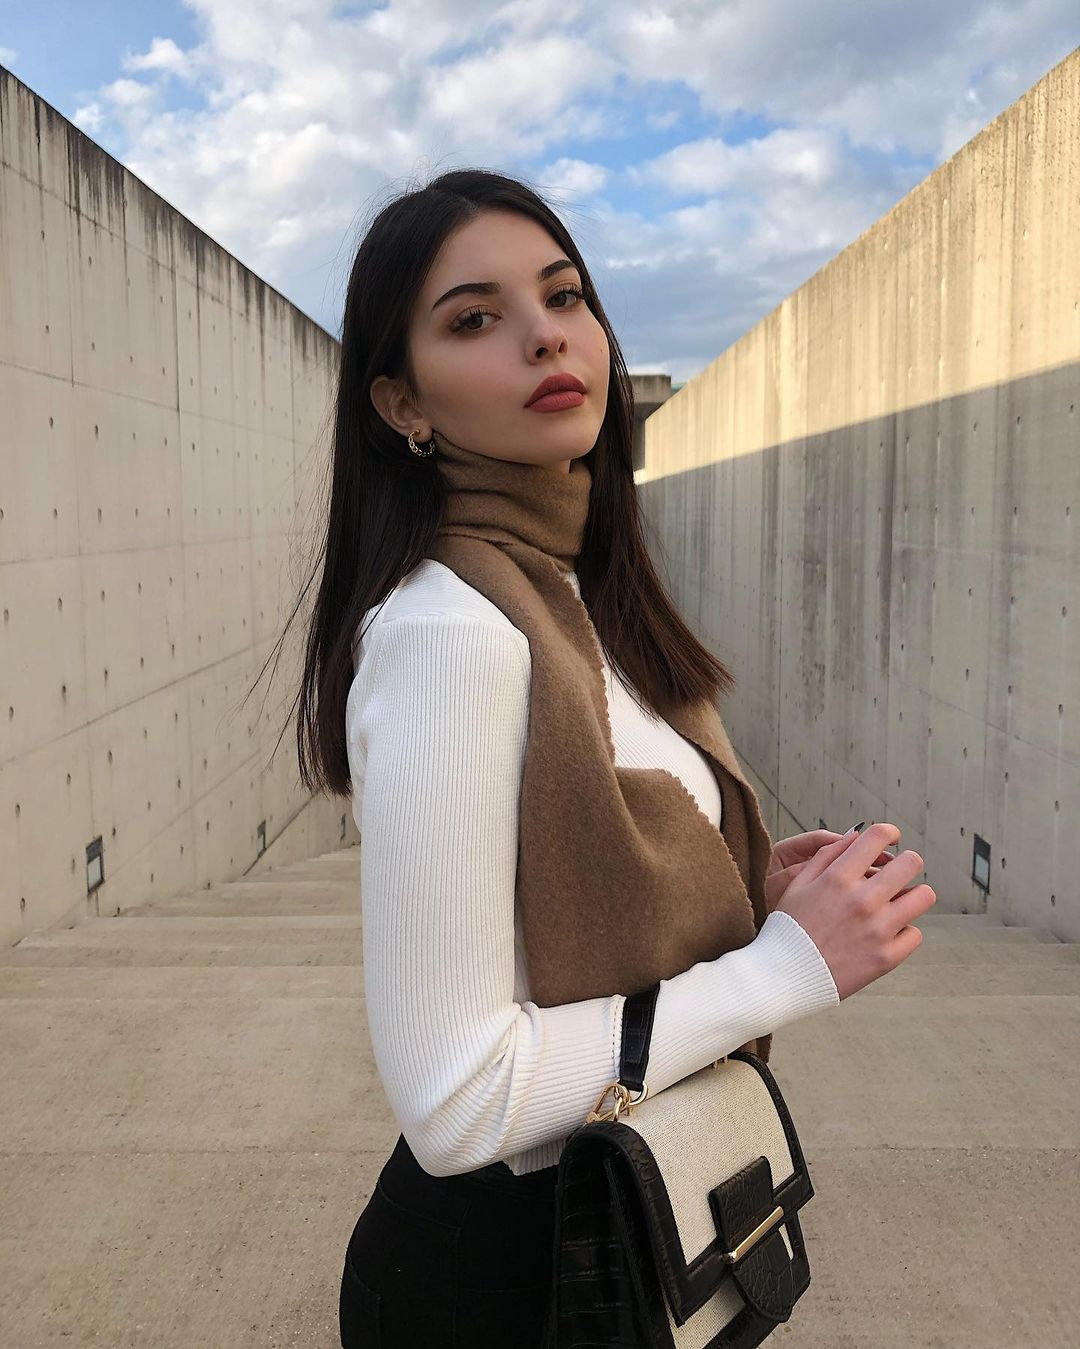 Melisa-Yamac-Wallpapers-Insta-Fit-Bio-7